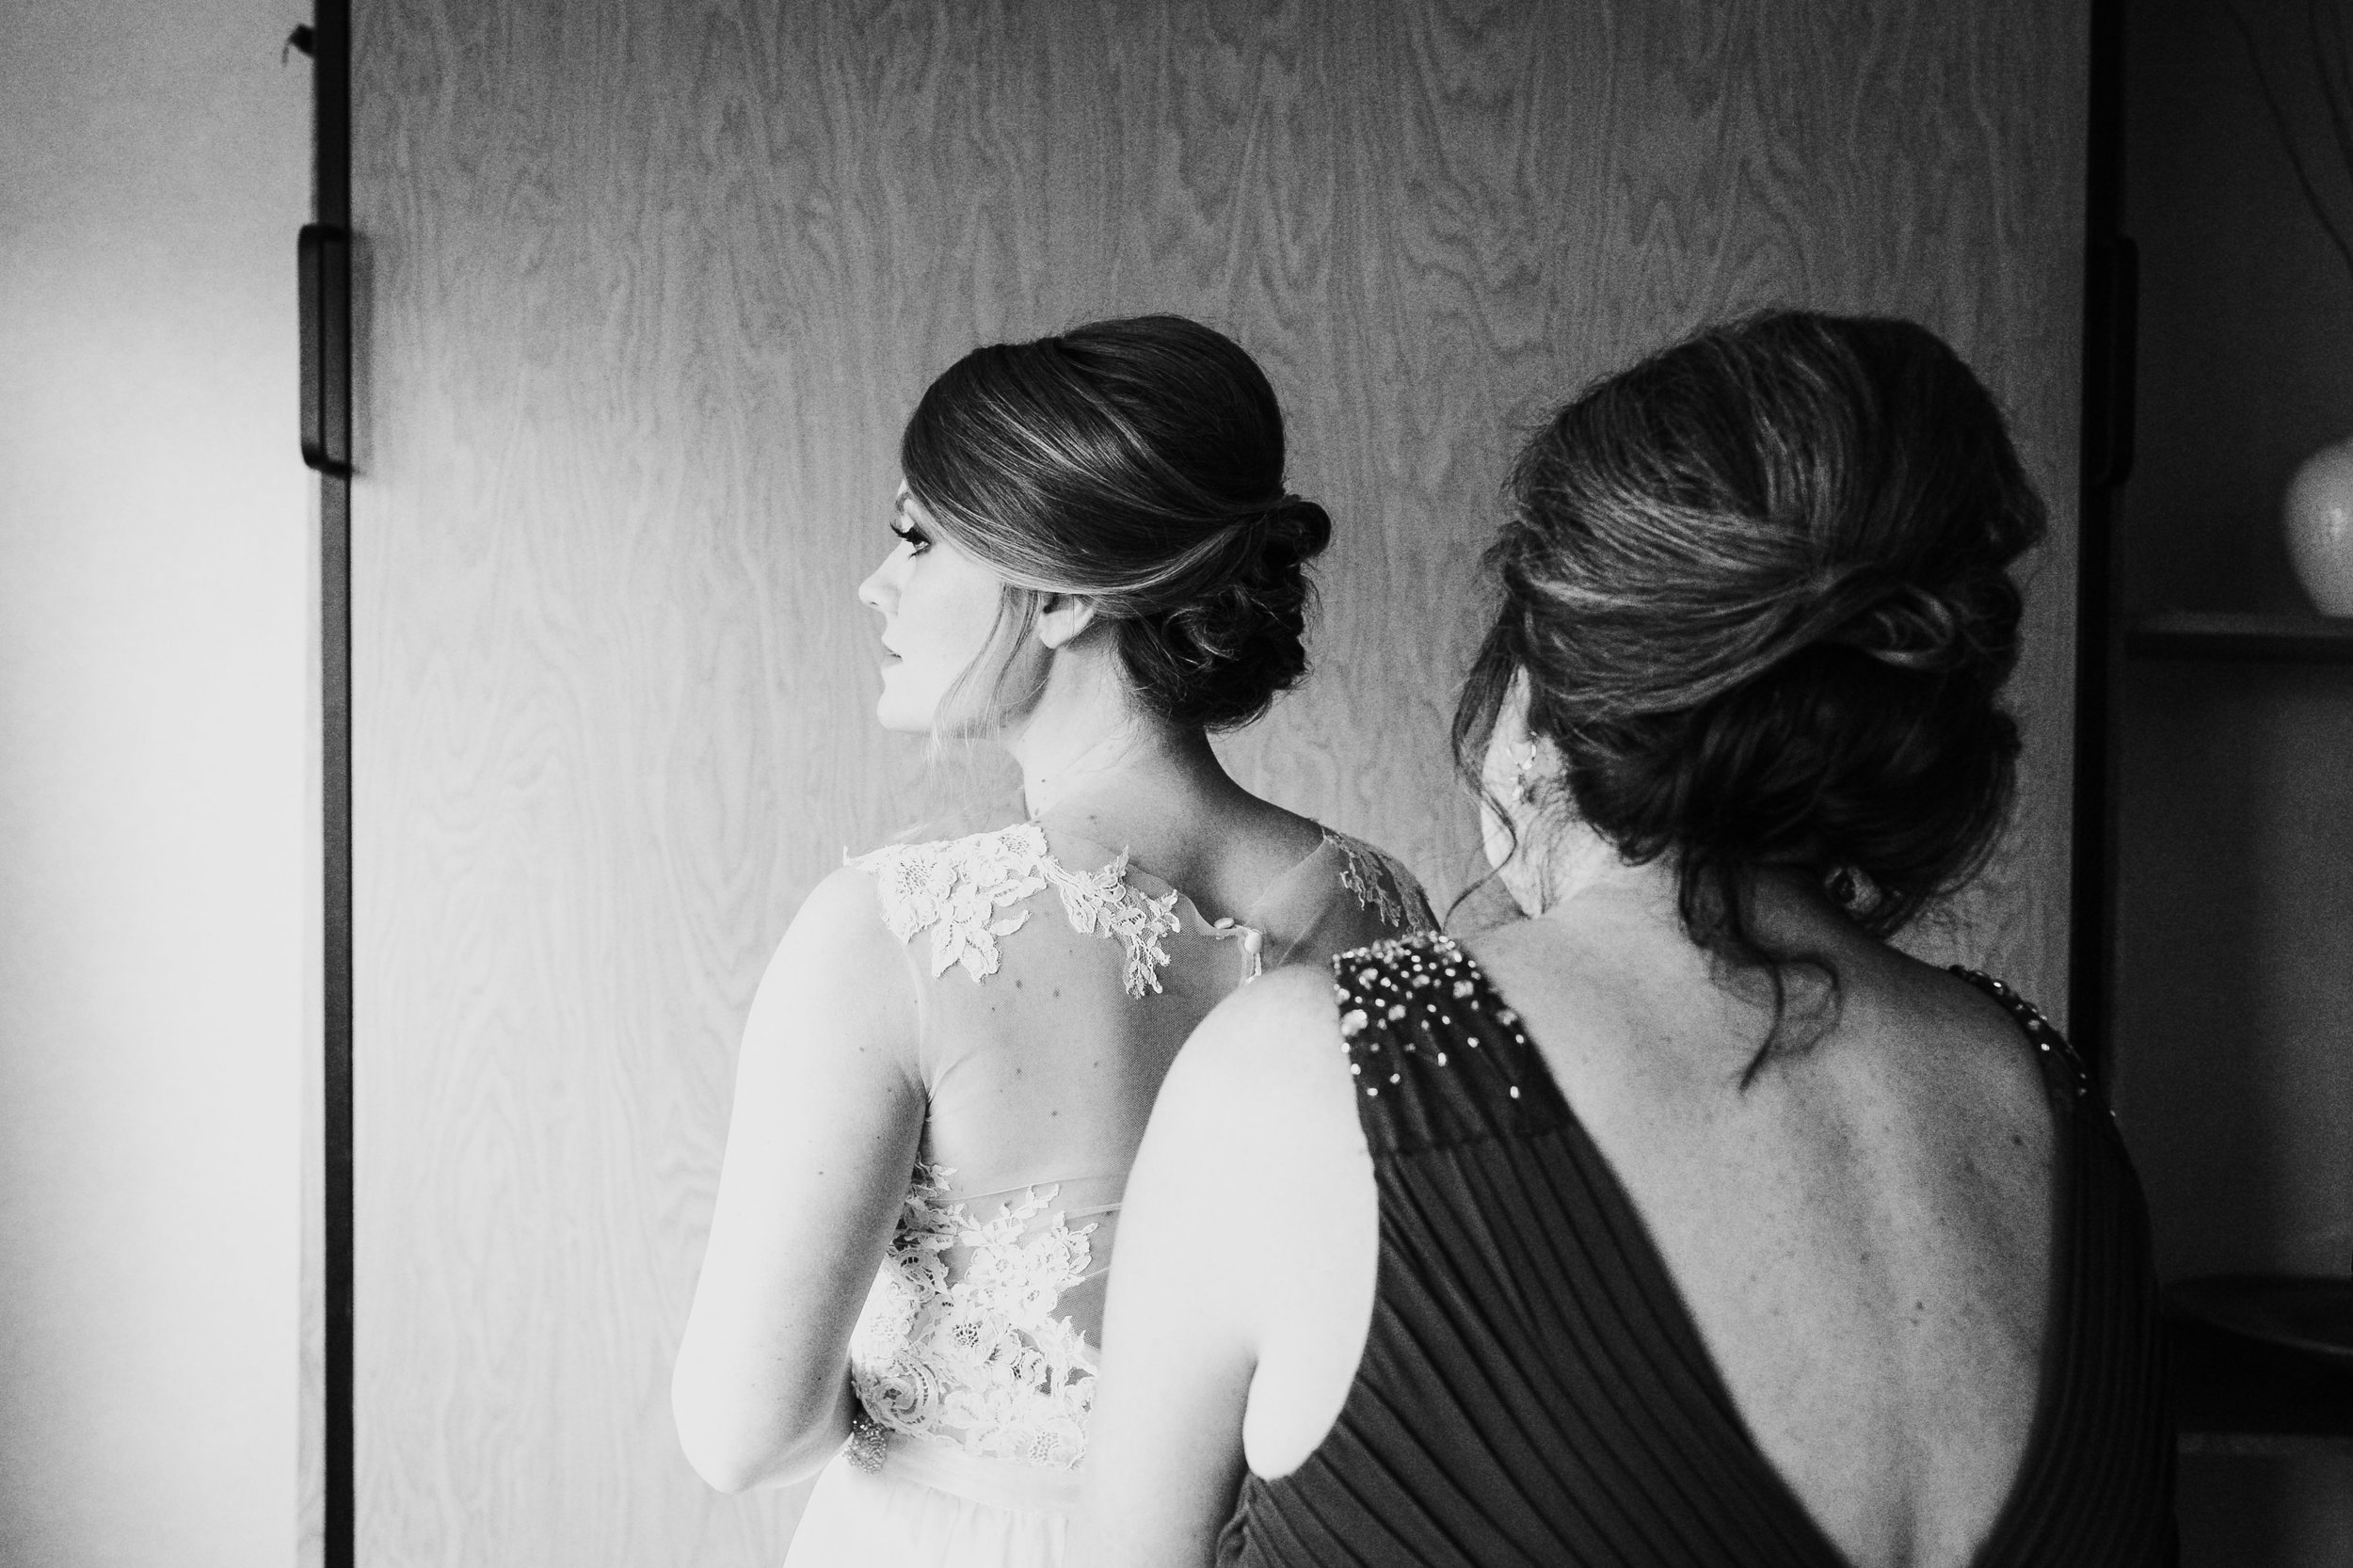 jessicabrandonwedding-13.jpg